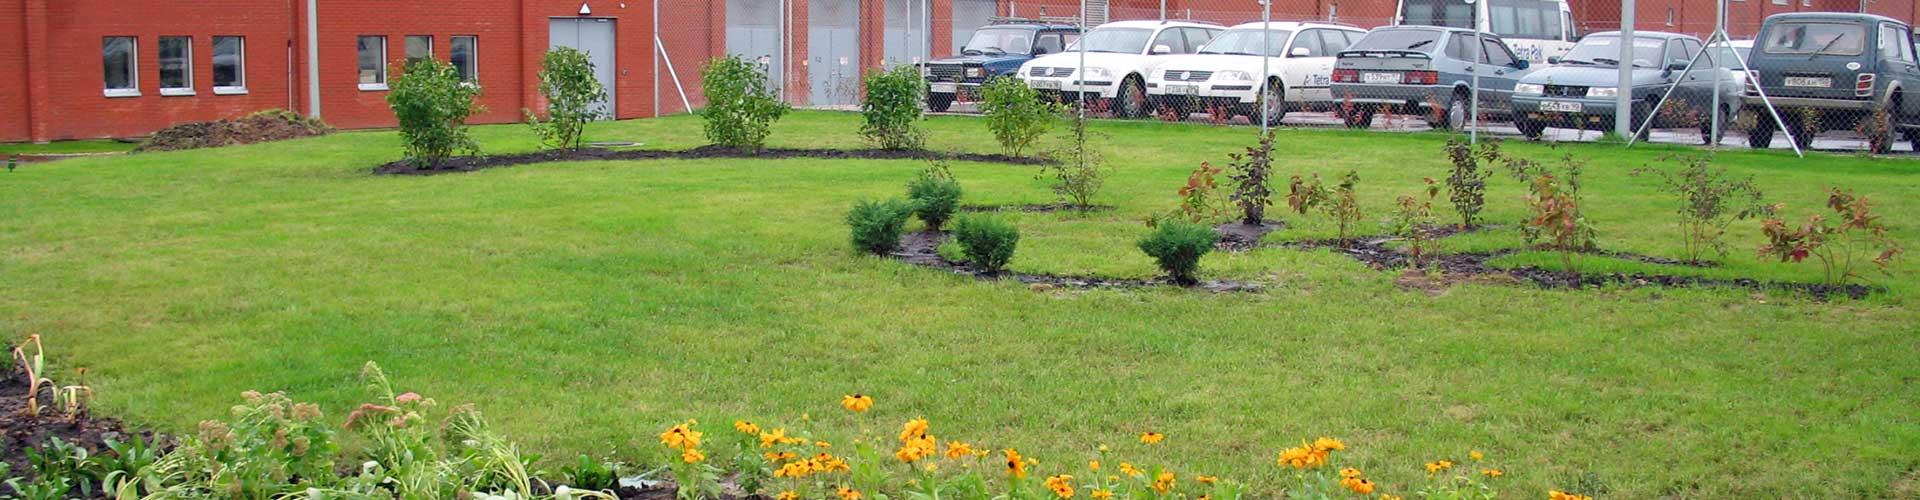 озеленение территории (проектирование и реализация)